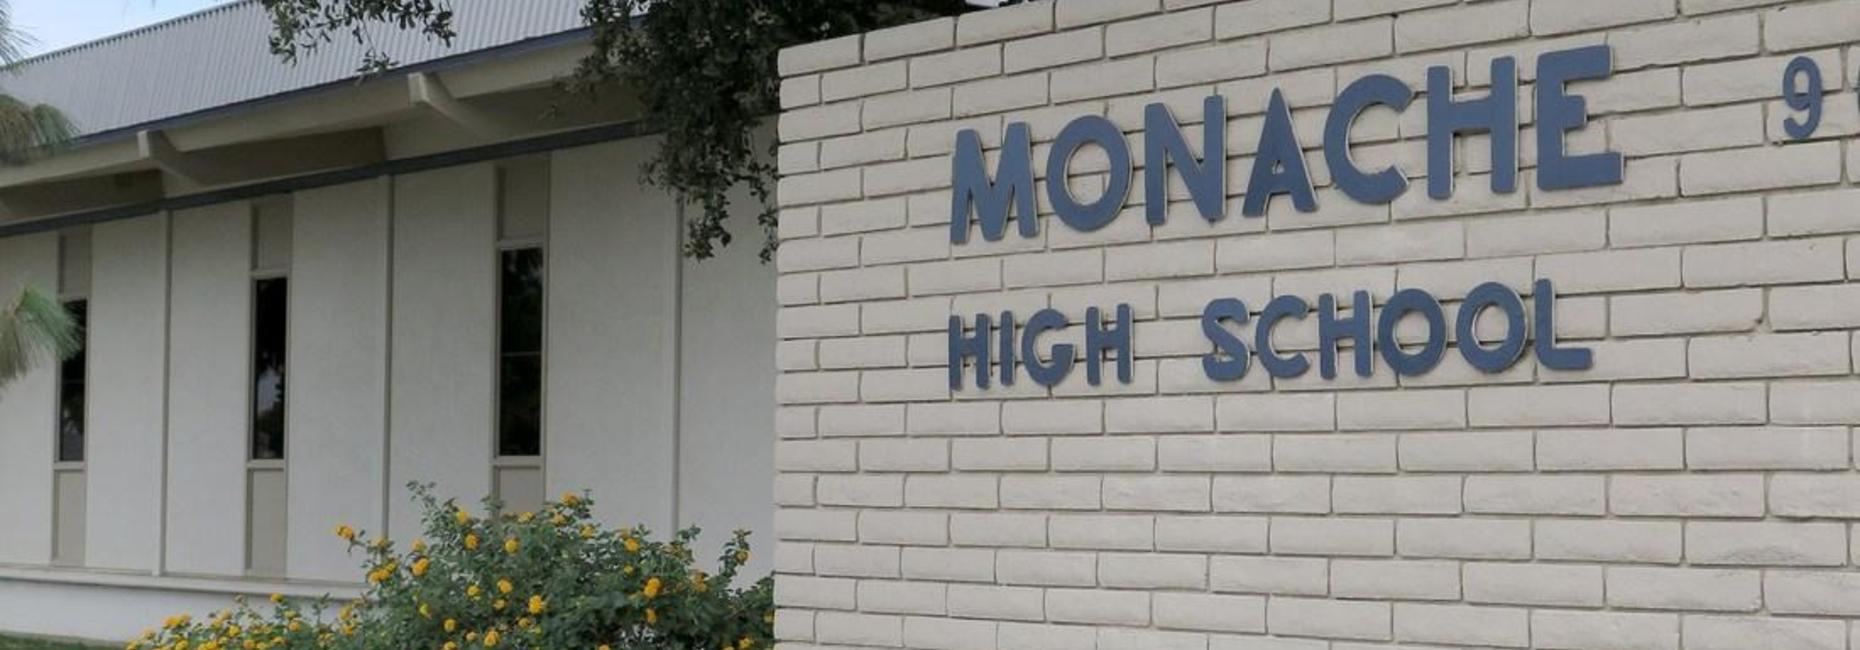 Monache High